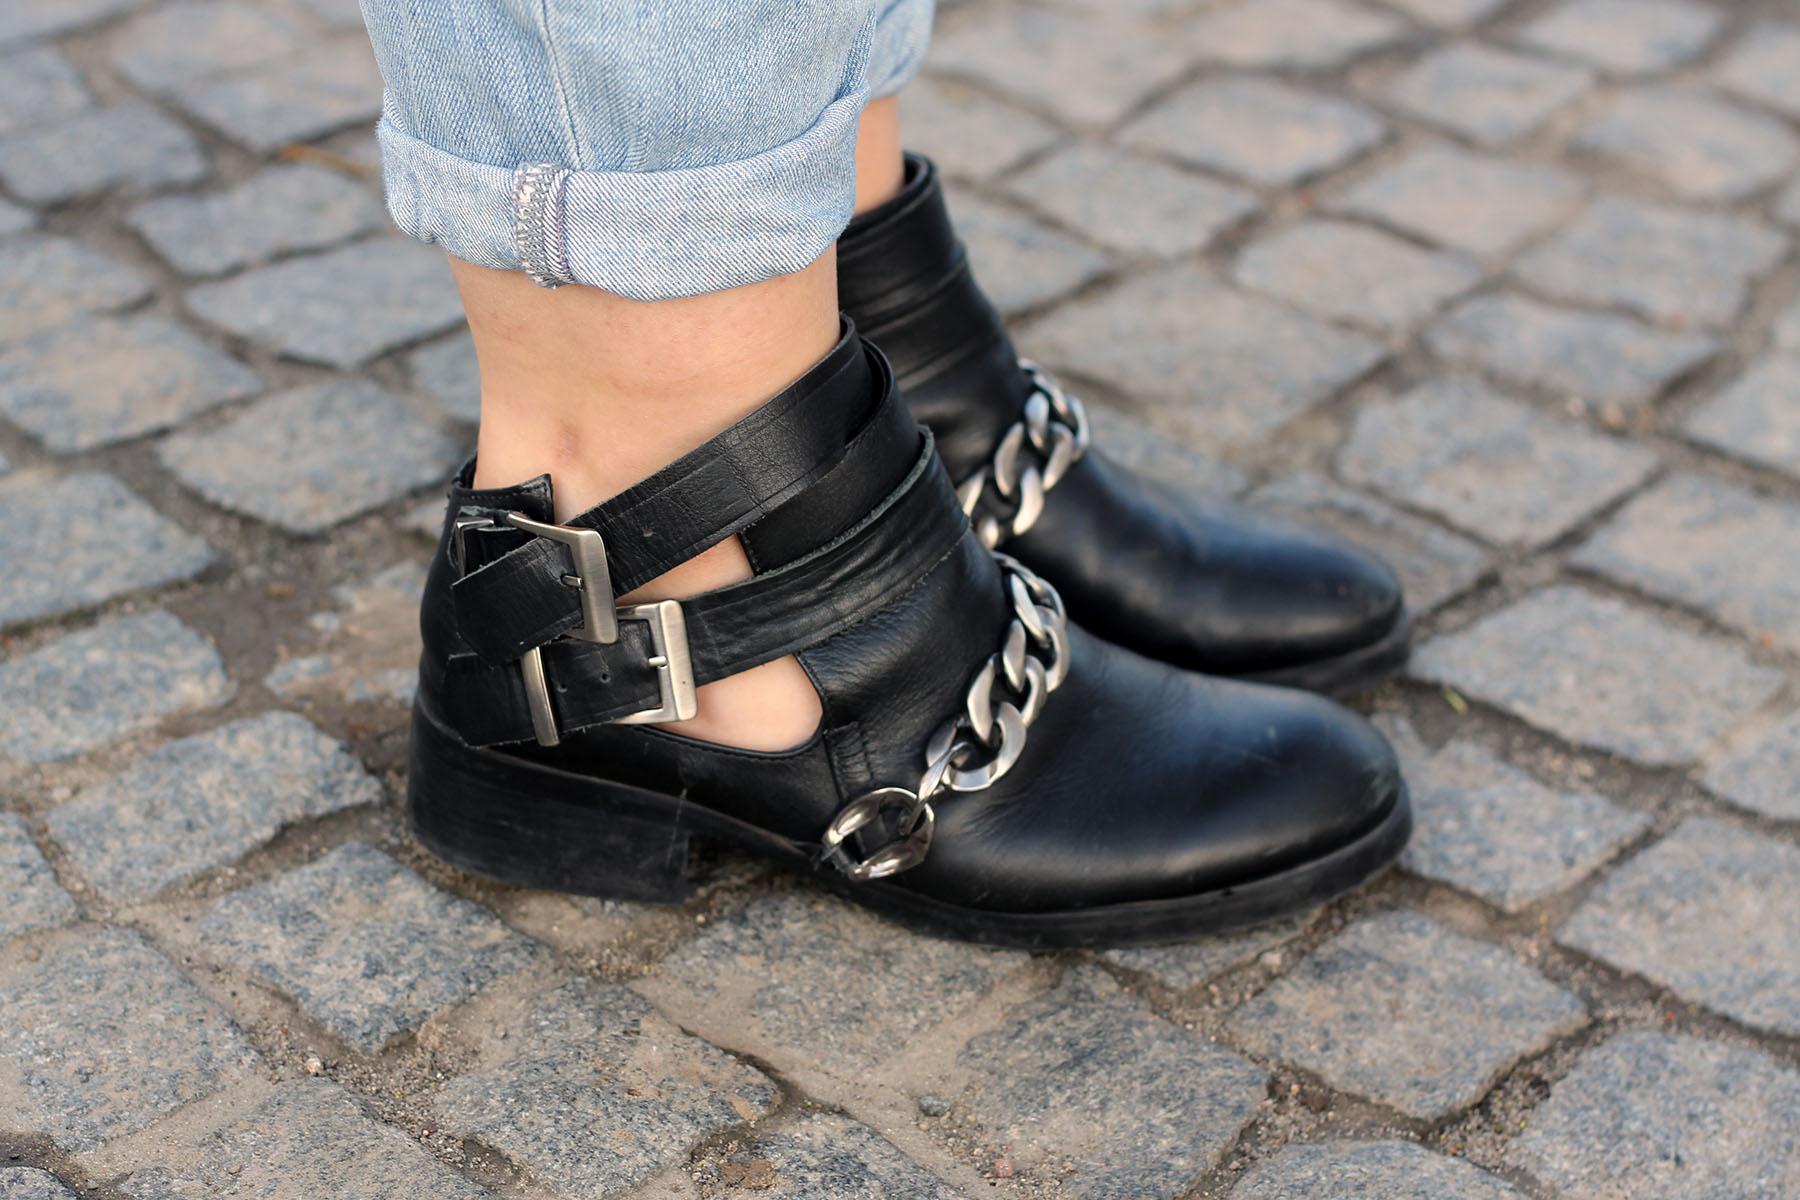 boots-zara-stiefeletten-stiefel-outfit-modeblog